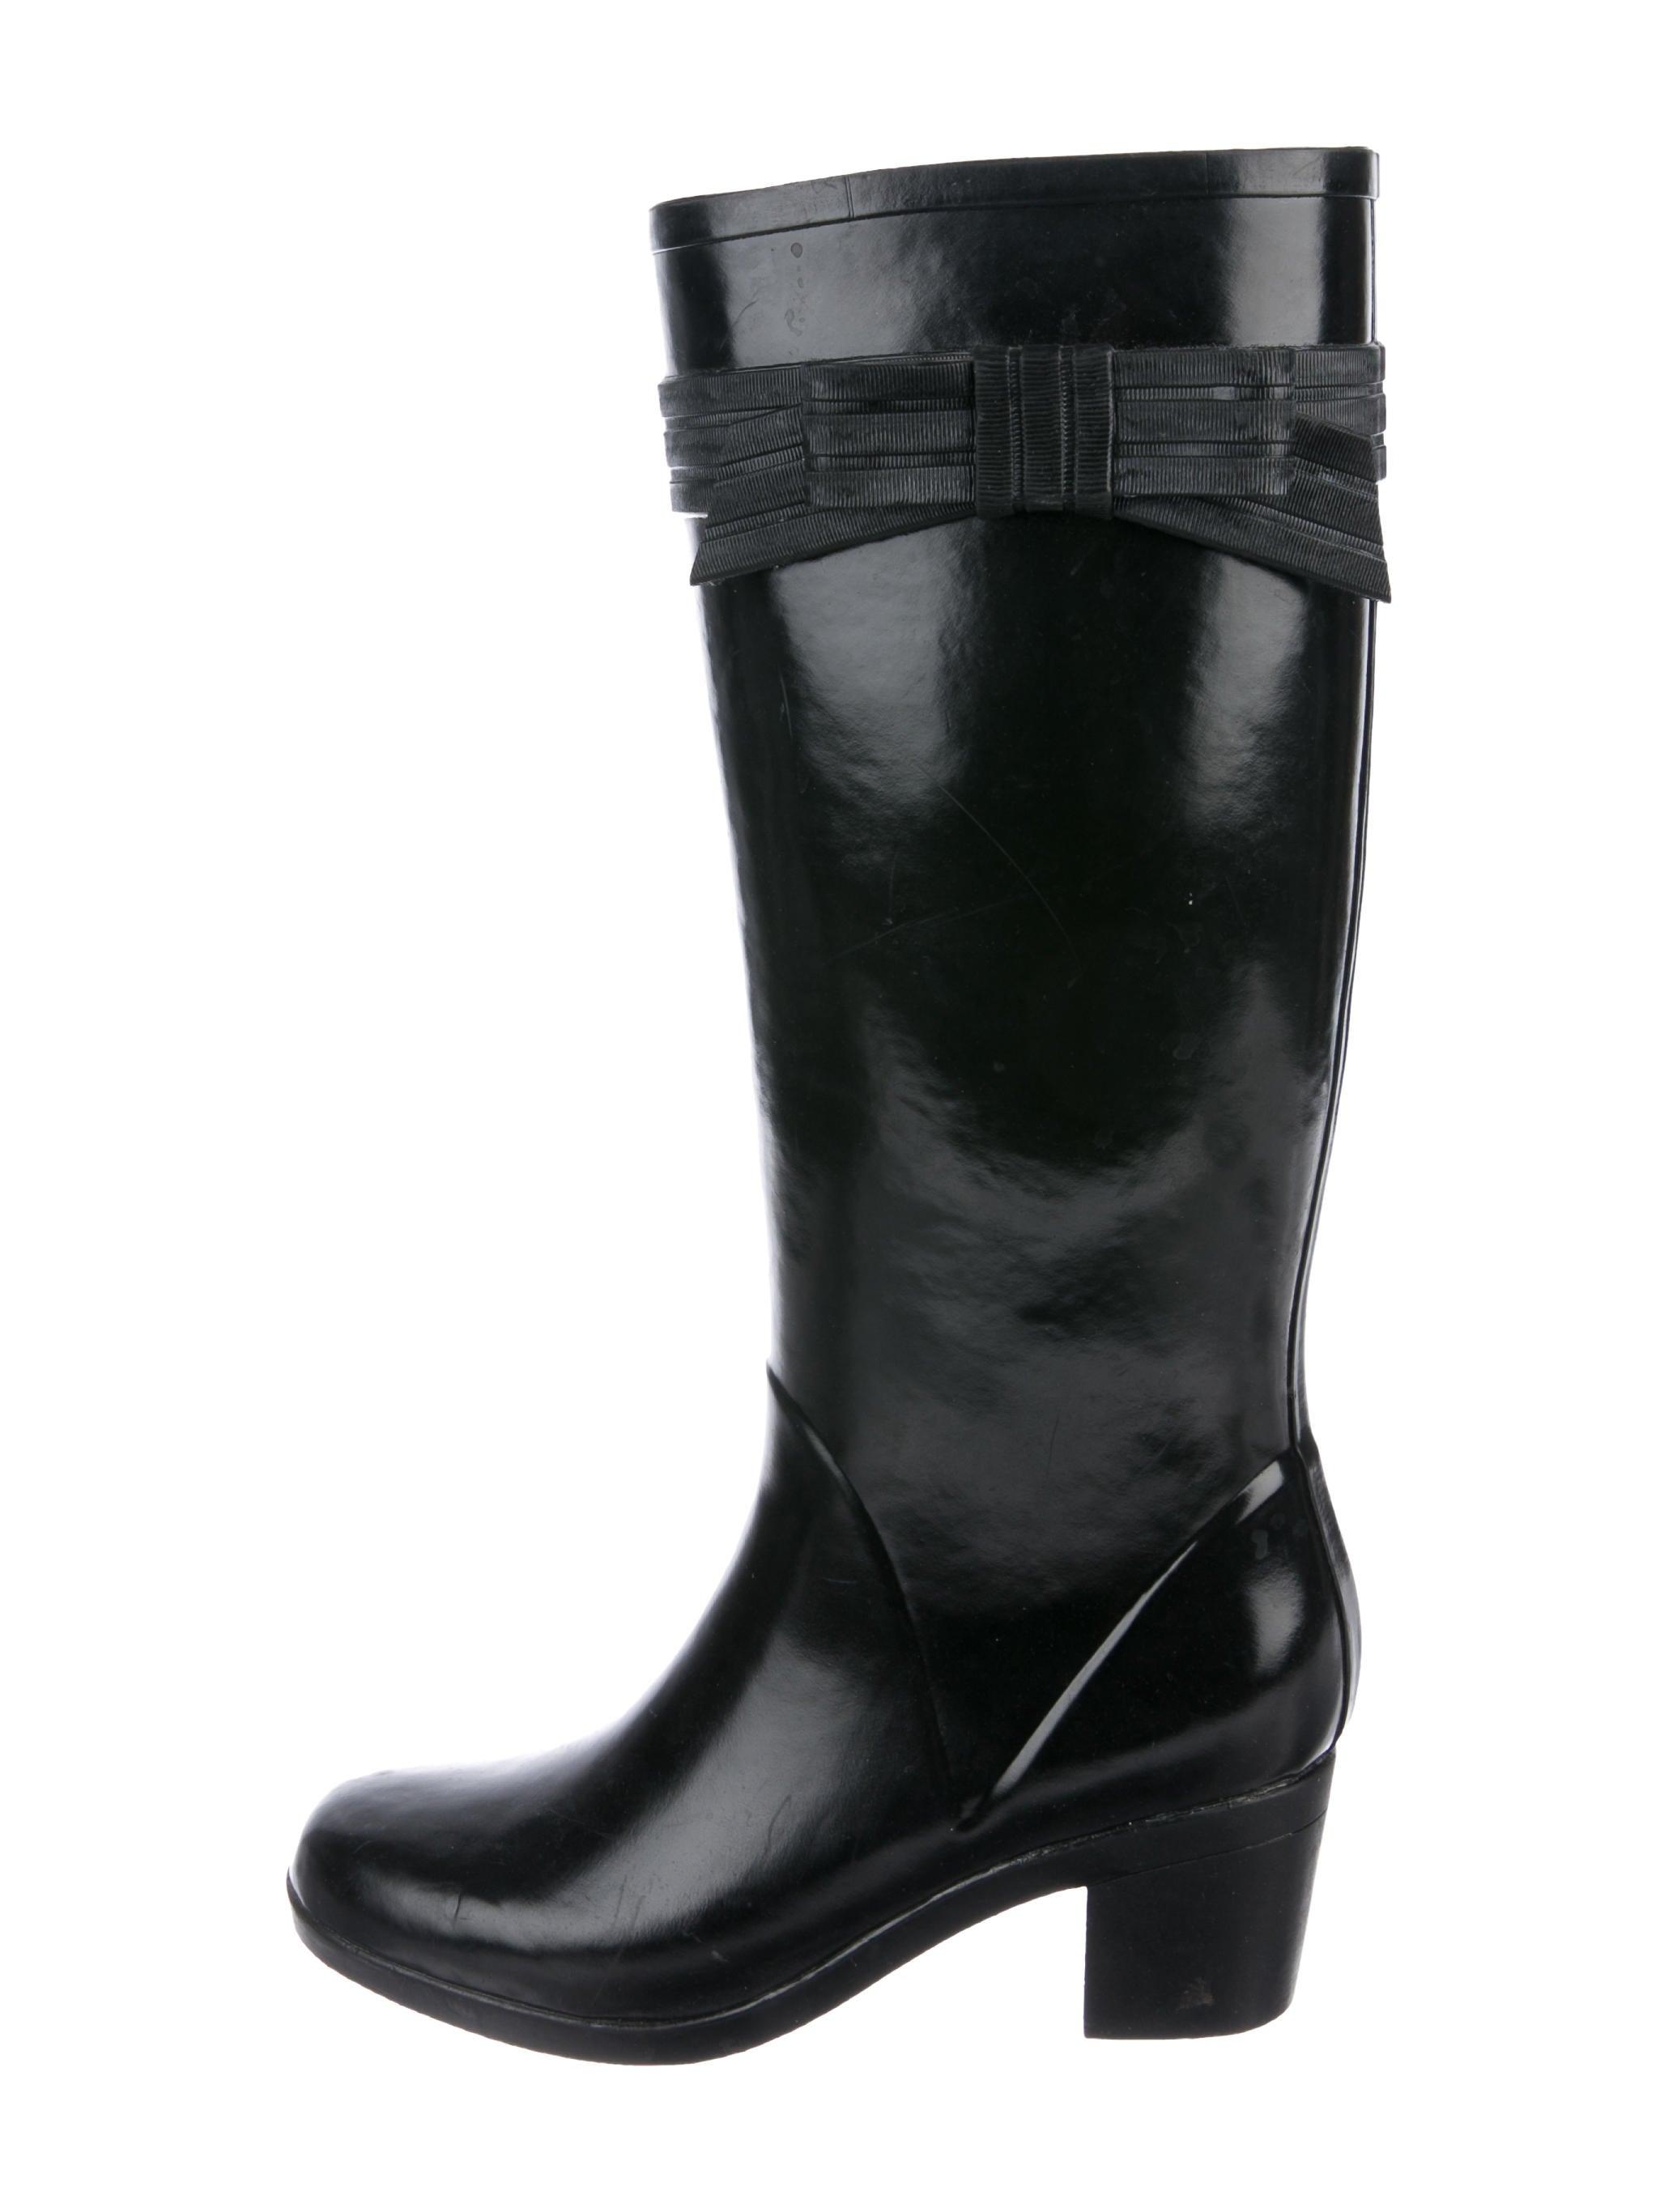 b2dcaeb4798d Kate Spade New York Rubber Rain Boots - Shoes - WKA105501